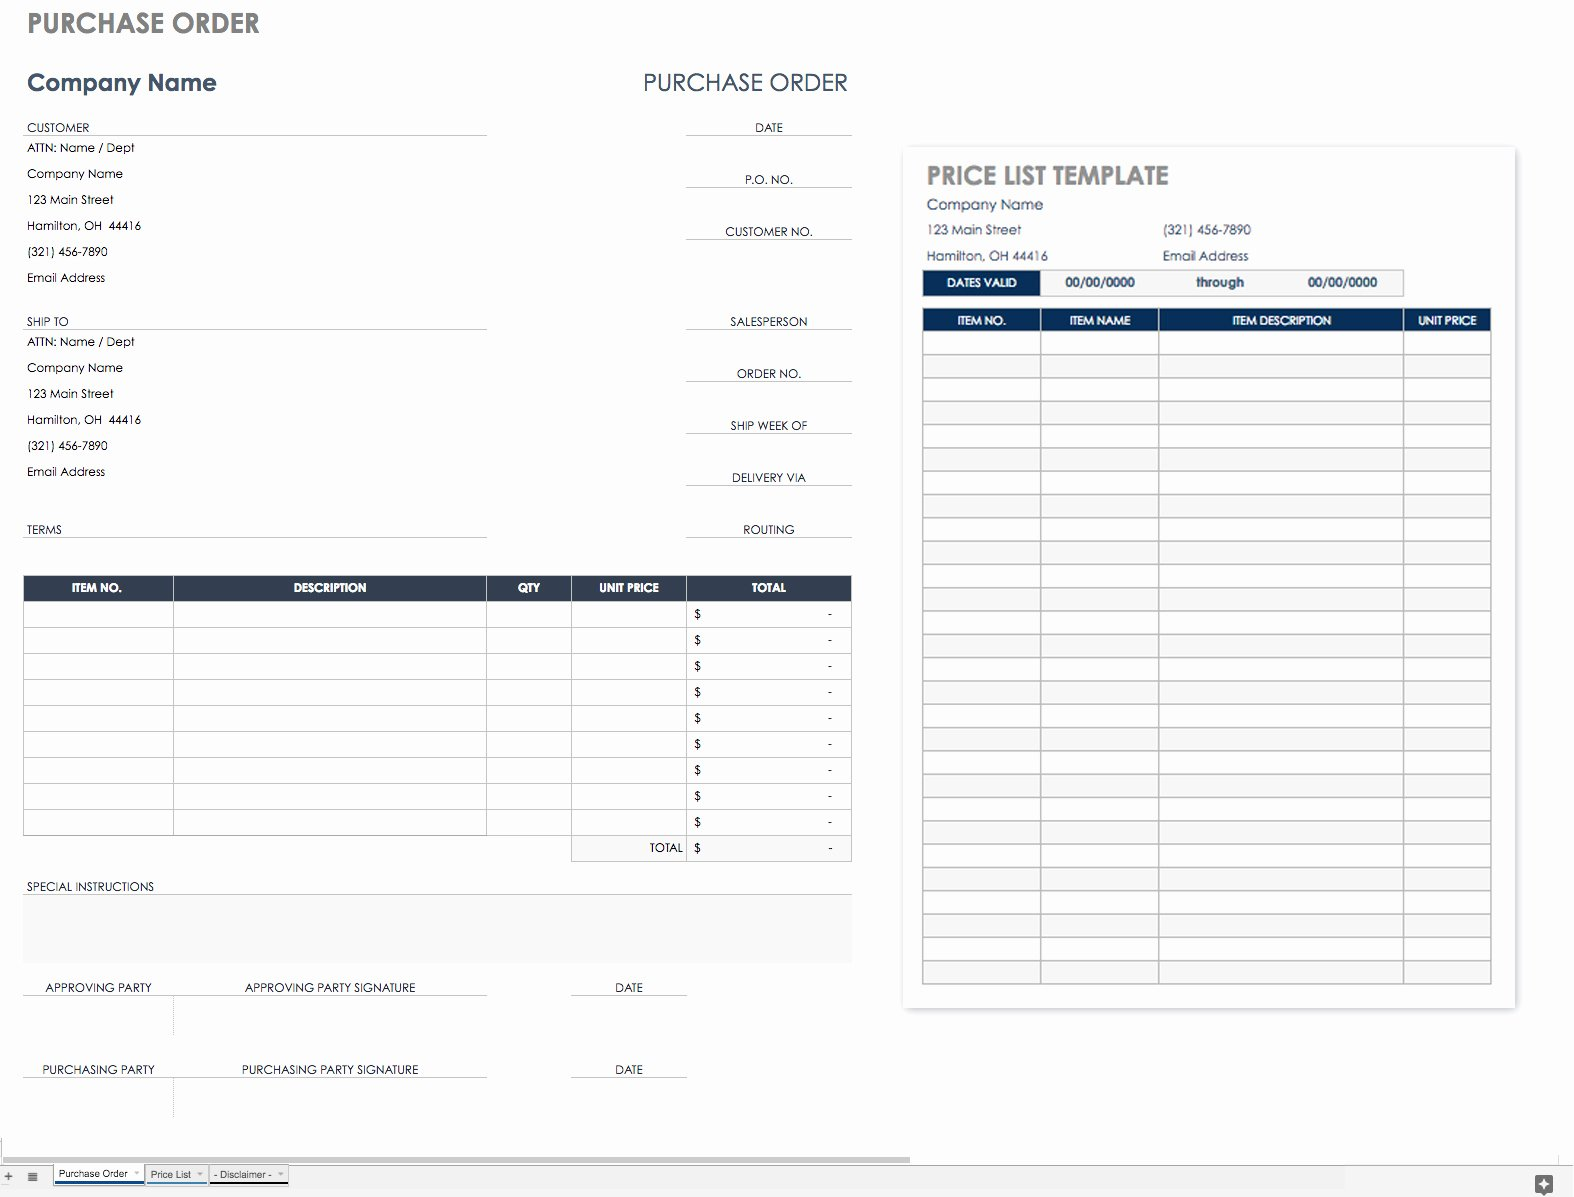 Interior Design Purchase order Template Elegant Free Purchase order Templates